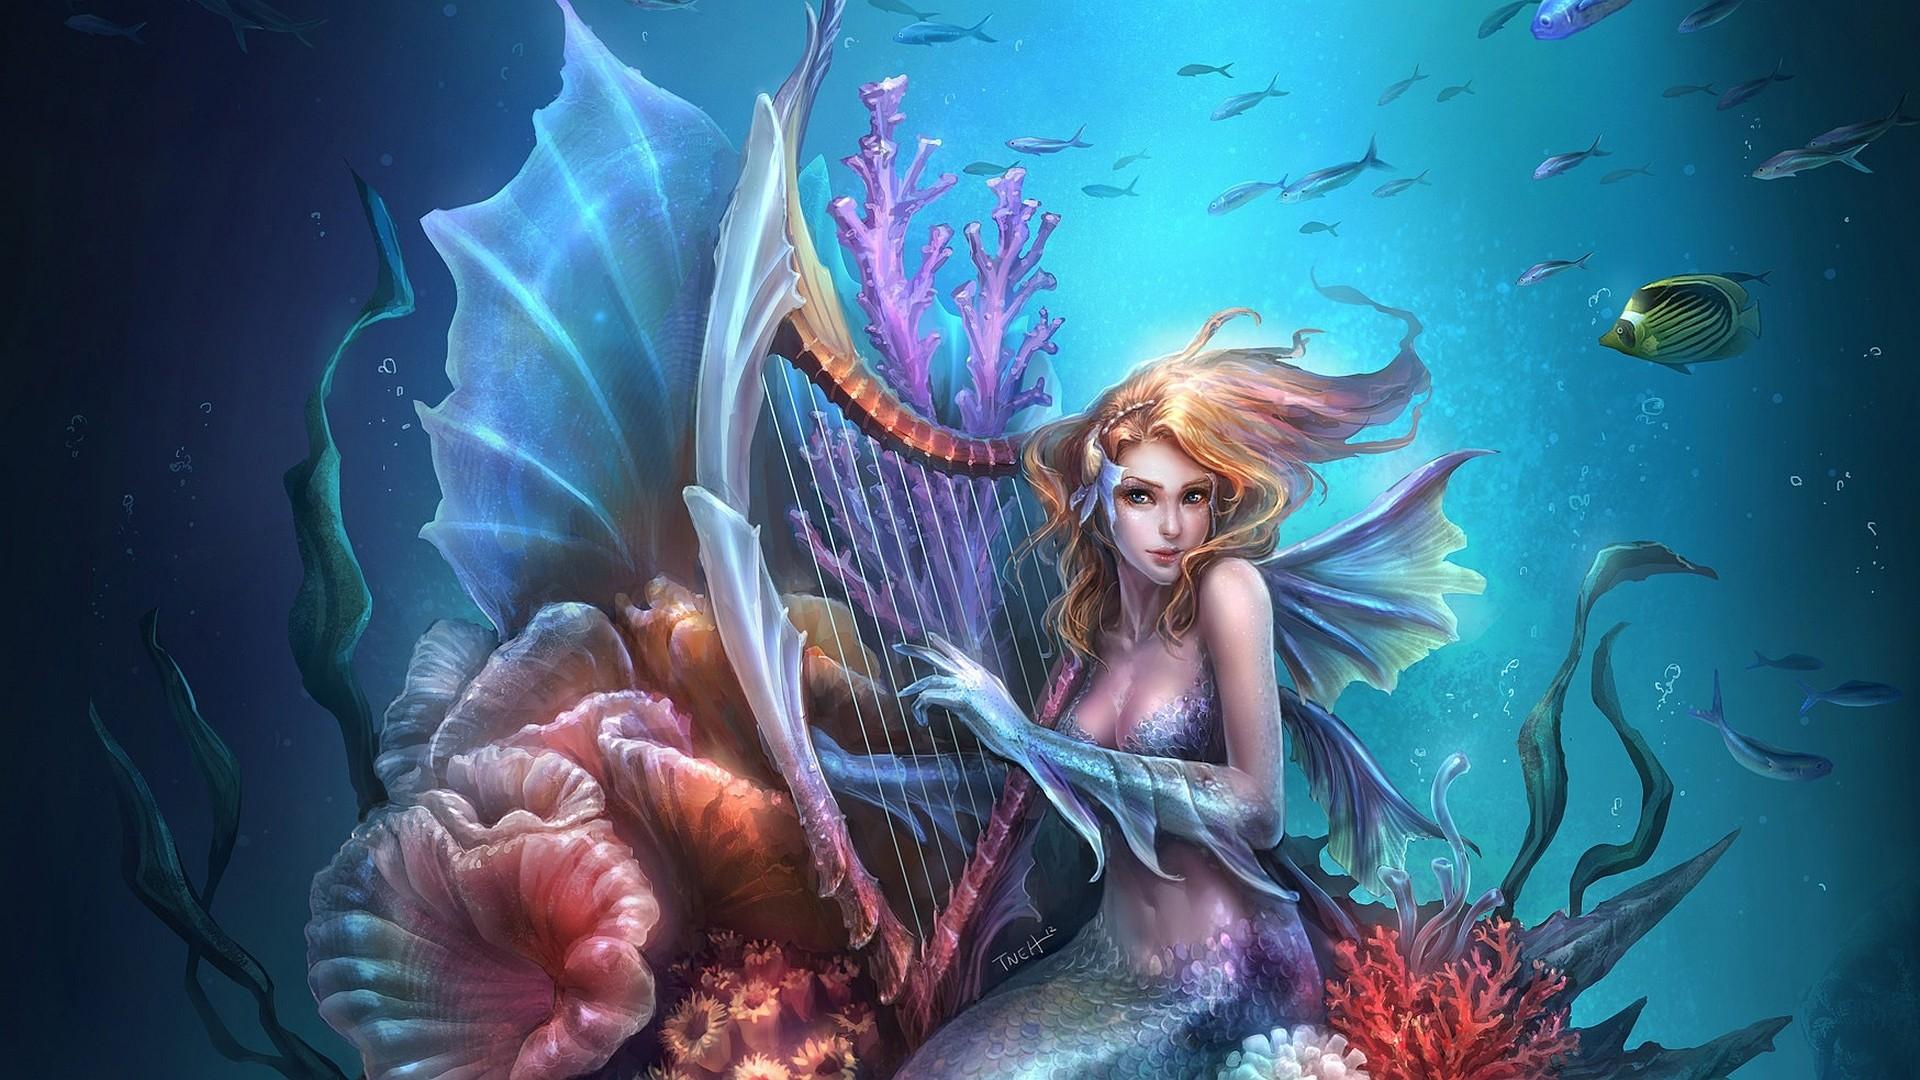 Siren Wallpaper Image